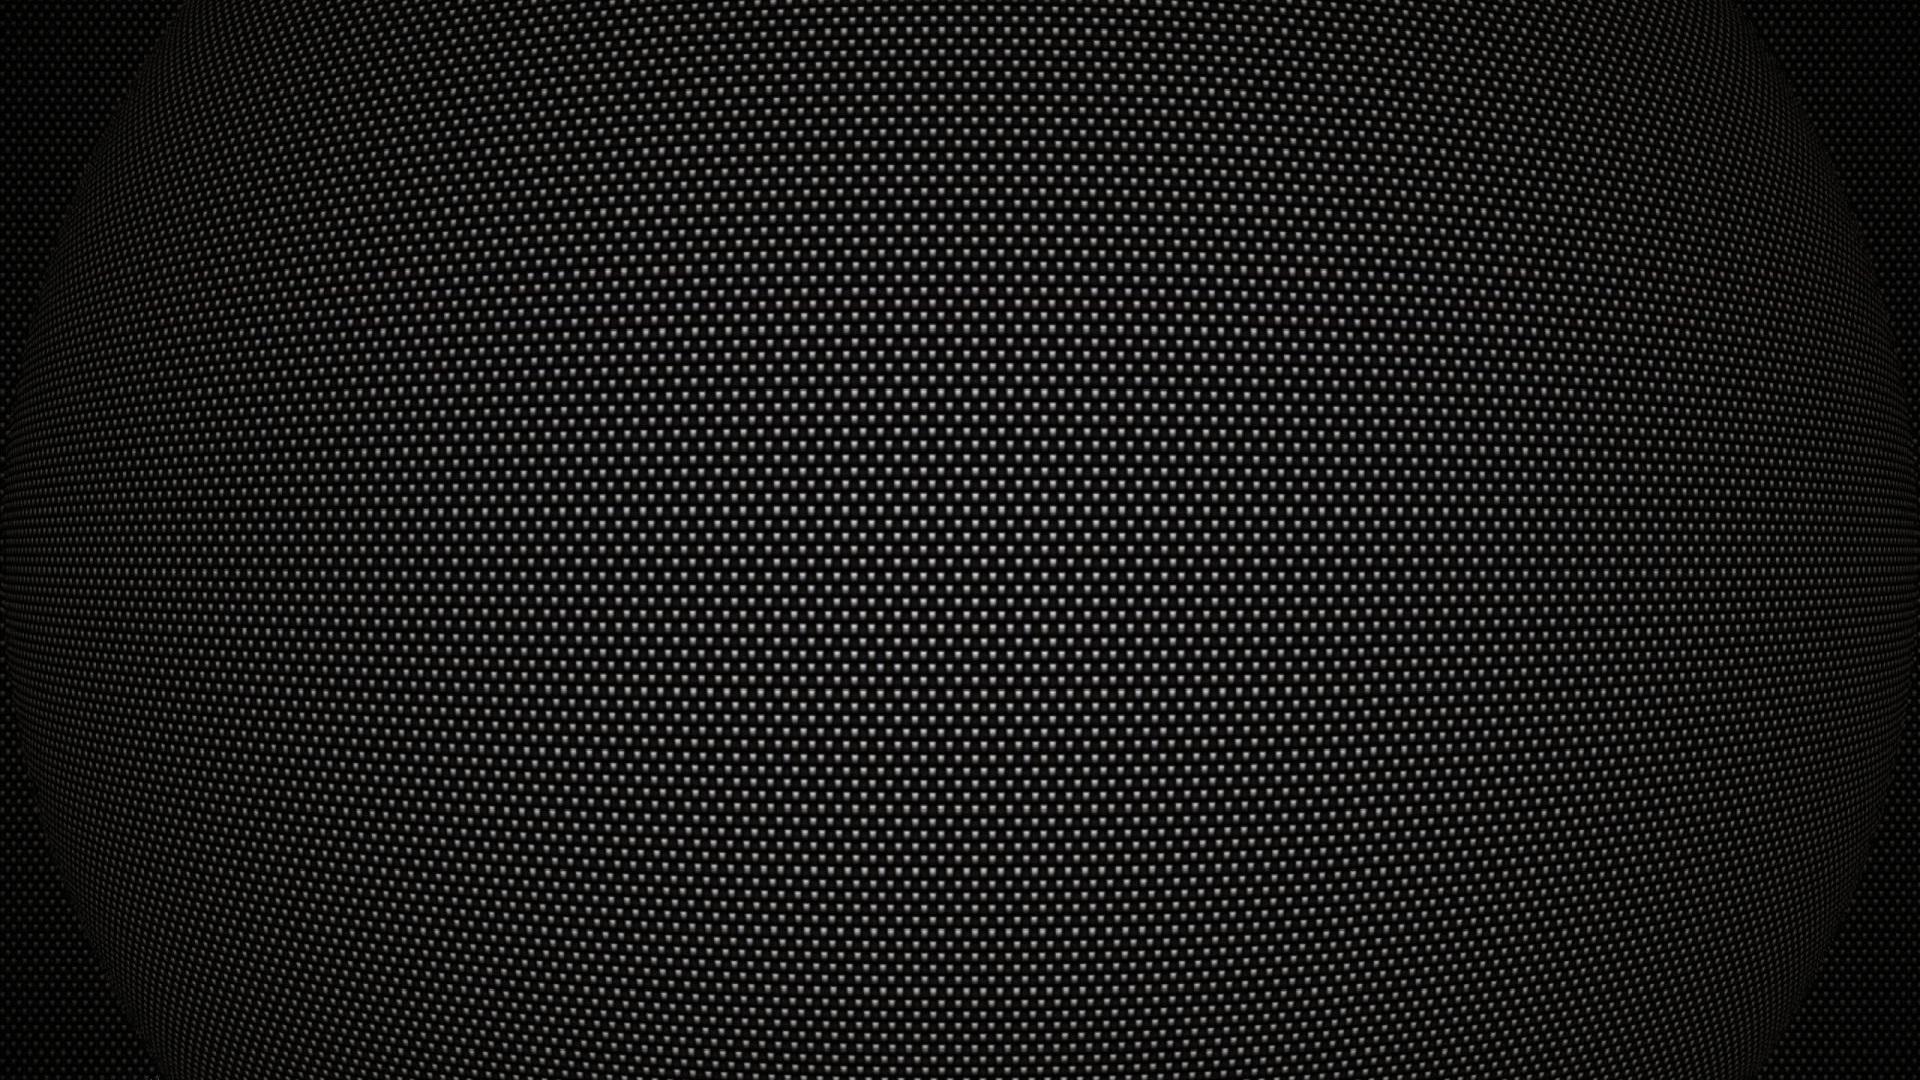 Black circle plain HD wallpaper HD Wallpapers Rocks 1920x1080